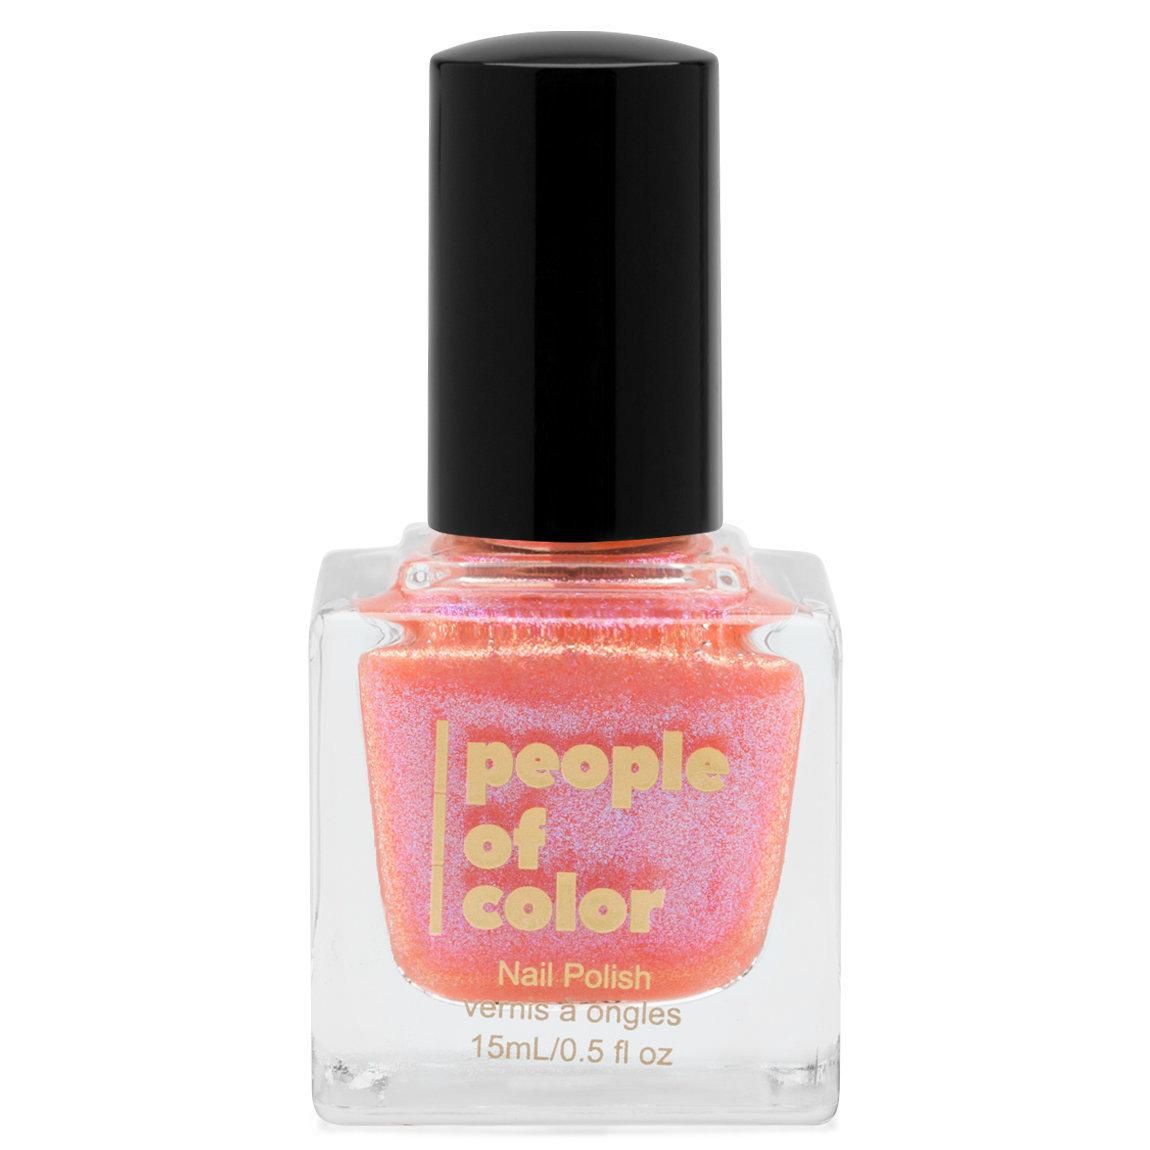 People of Color Beauty Nail Polish Unicorn alternative view 1.